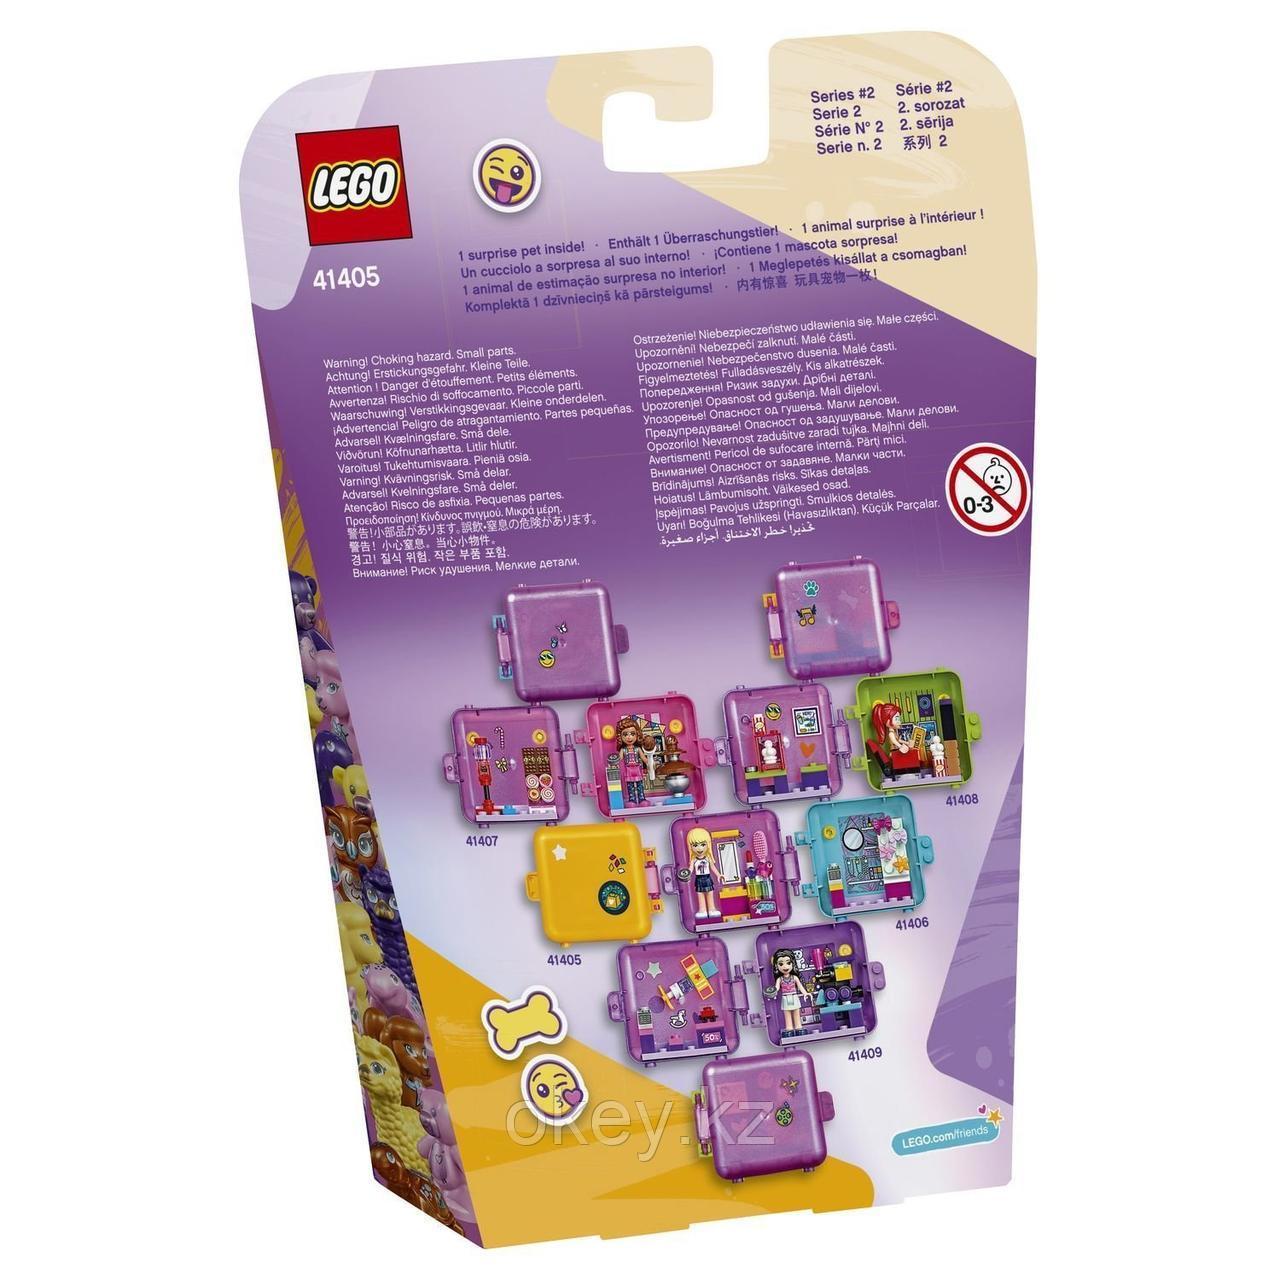 LEGO Friends: Игровая шкатулка Покупки Андреа 41405 - фото 3